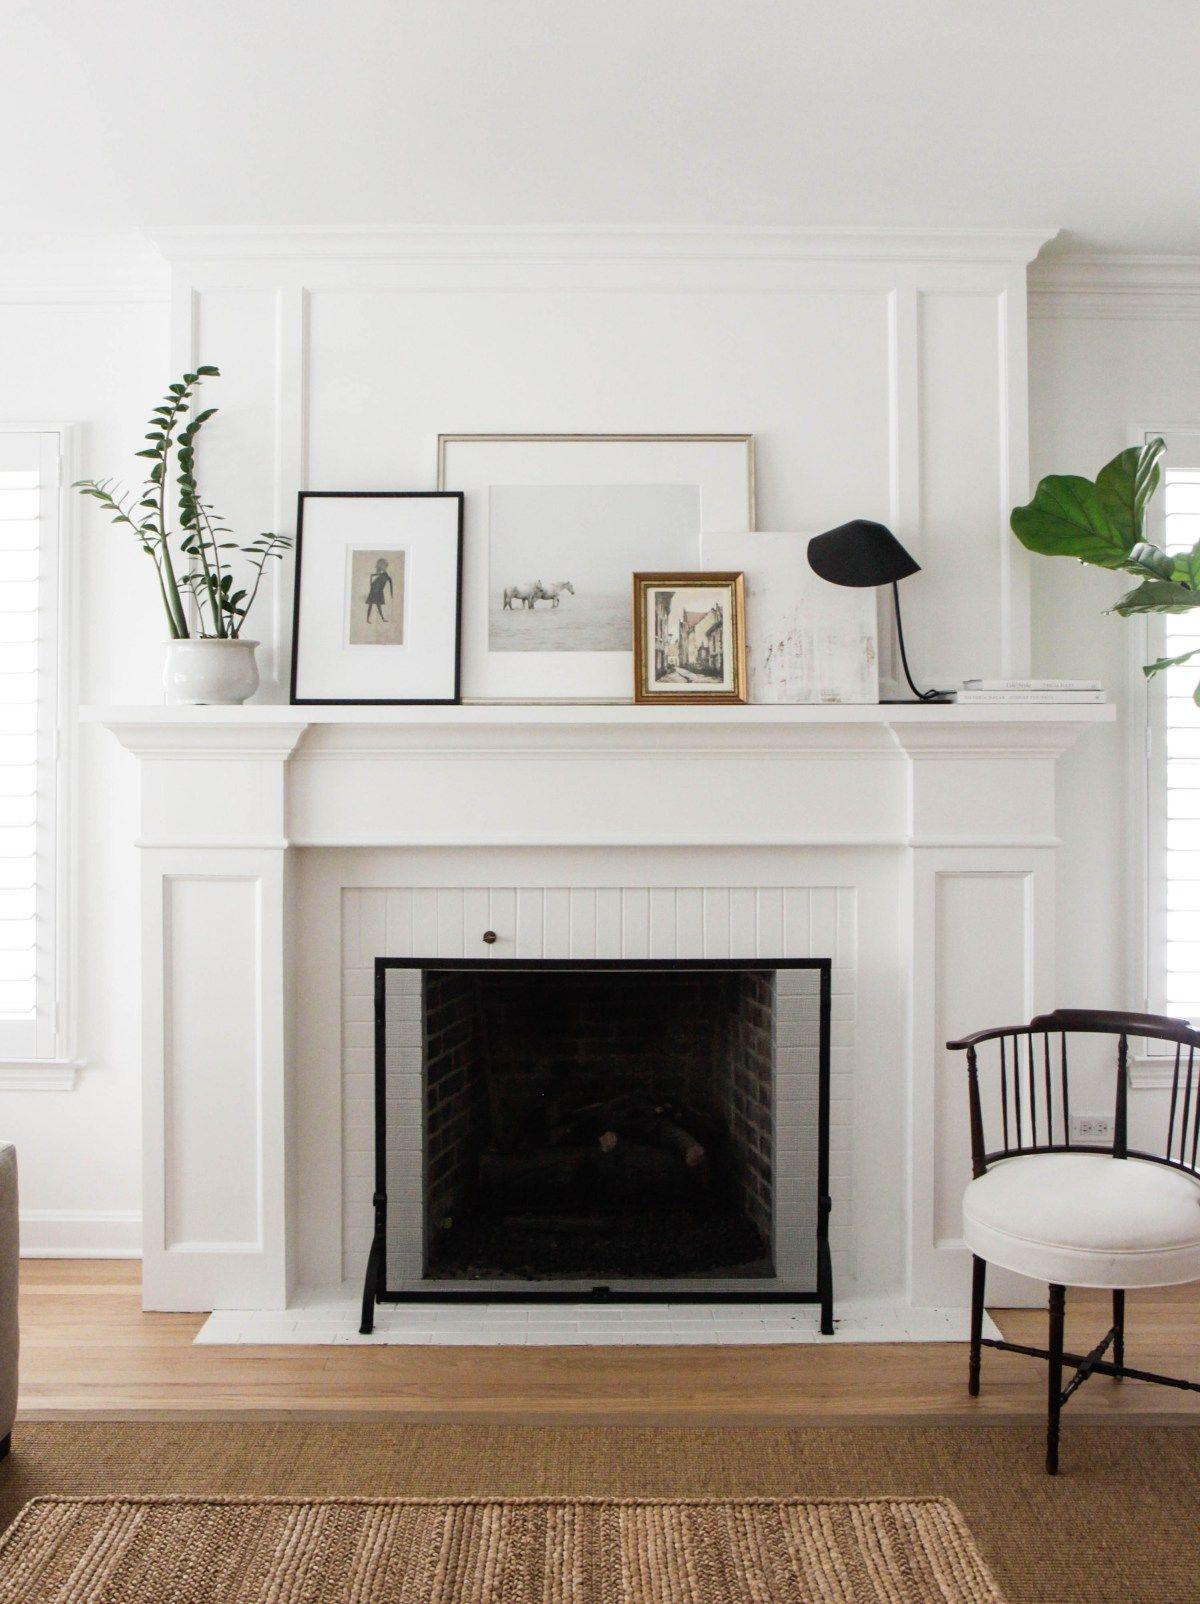 Mantel Styling Home Fireplace White Fireplace Fireplace Surrounds